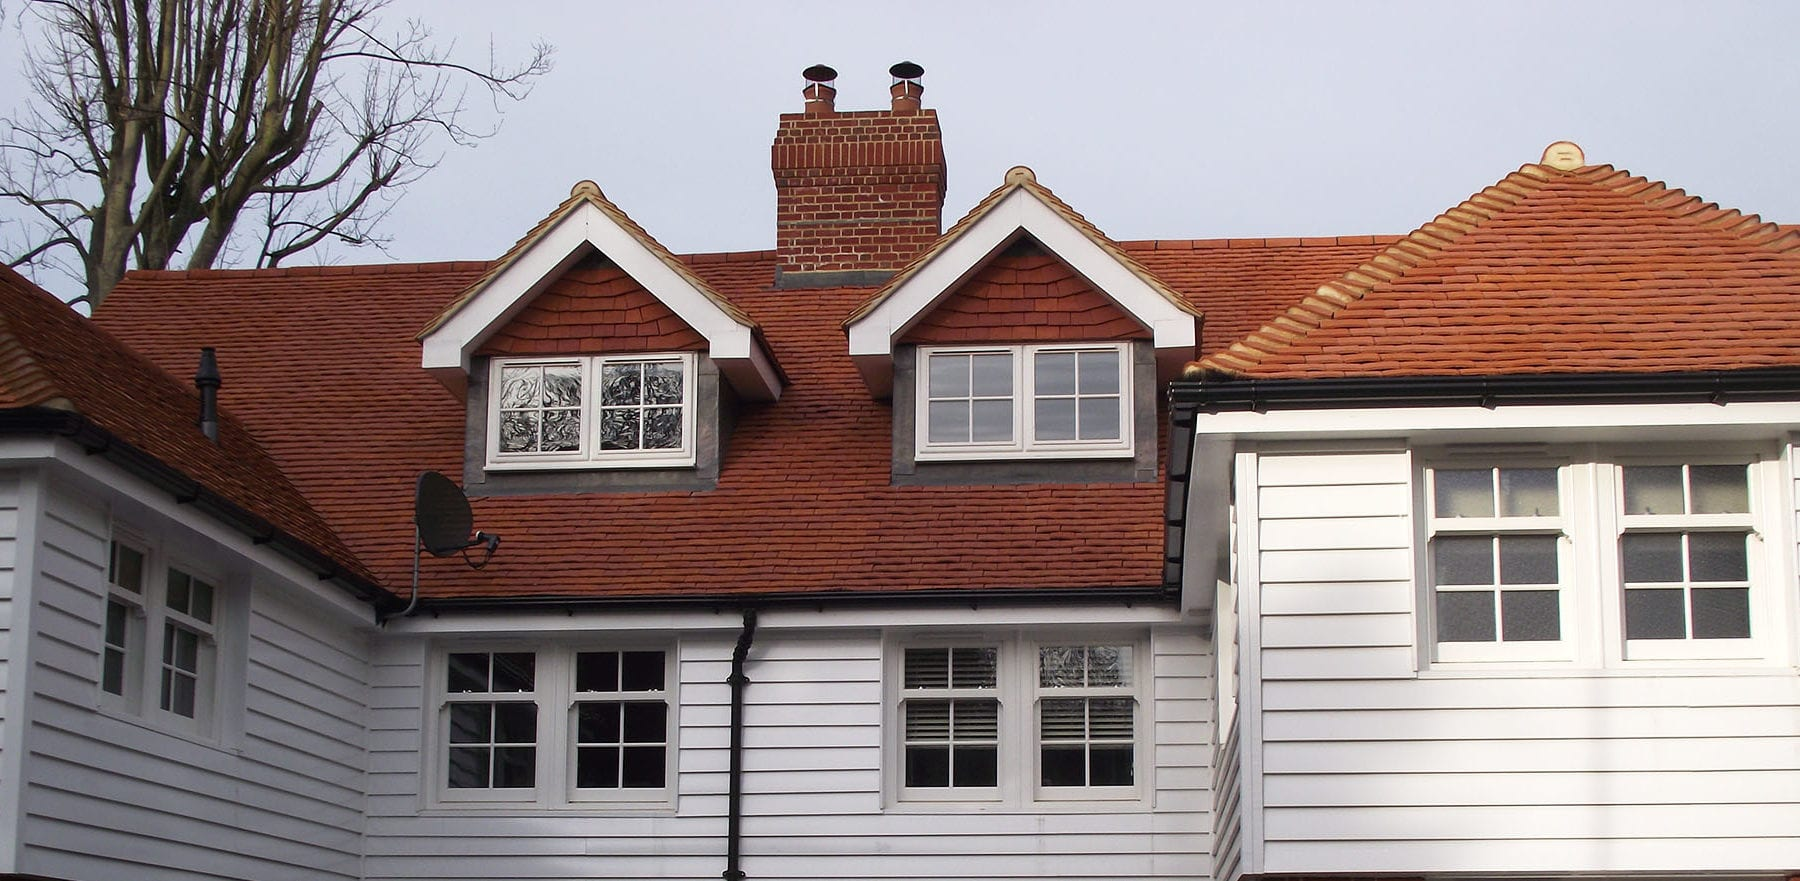 Lifestiles - Handcrafted Orange Clay Roof Tiles - Farningham, England 5